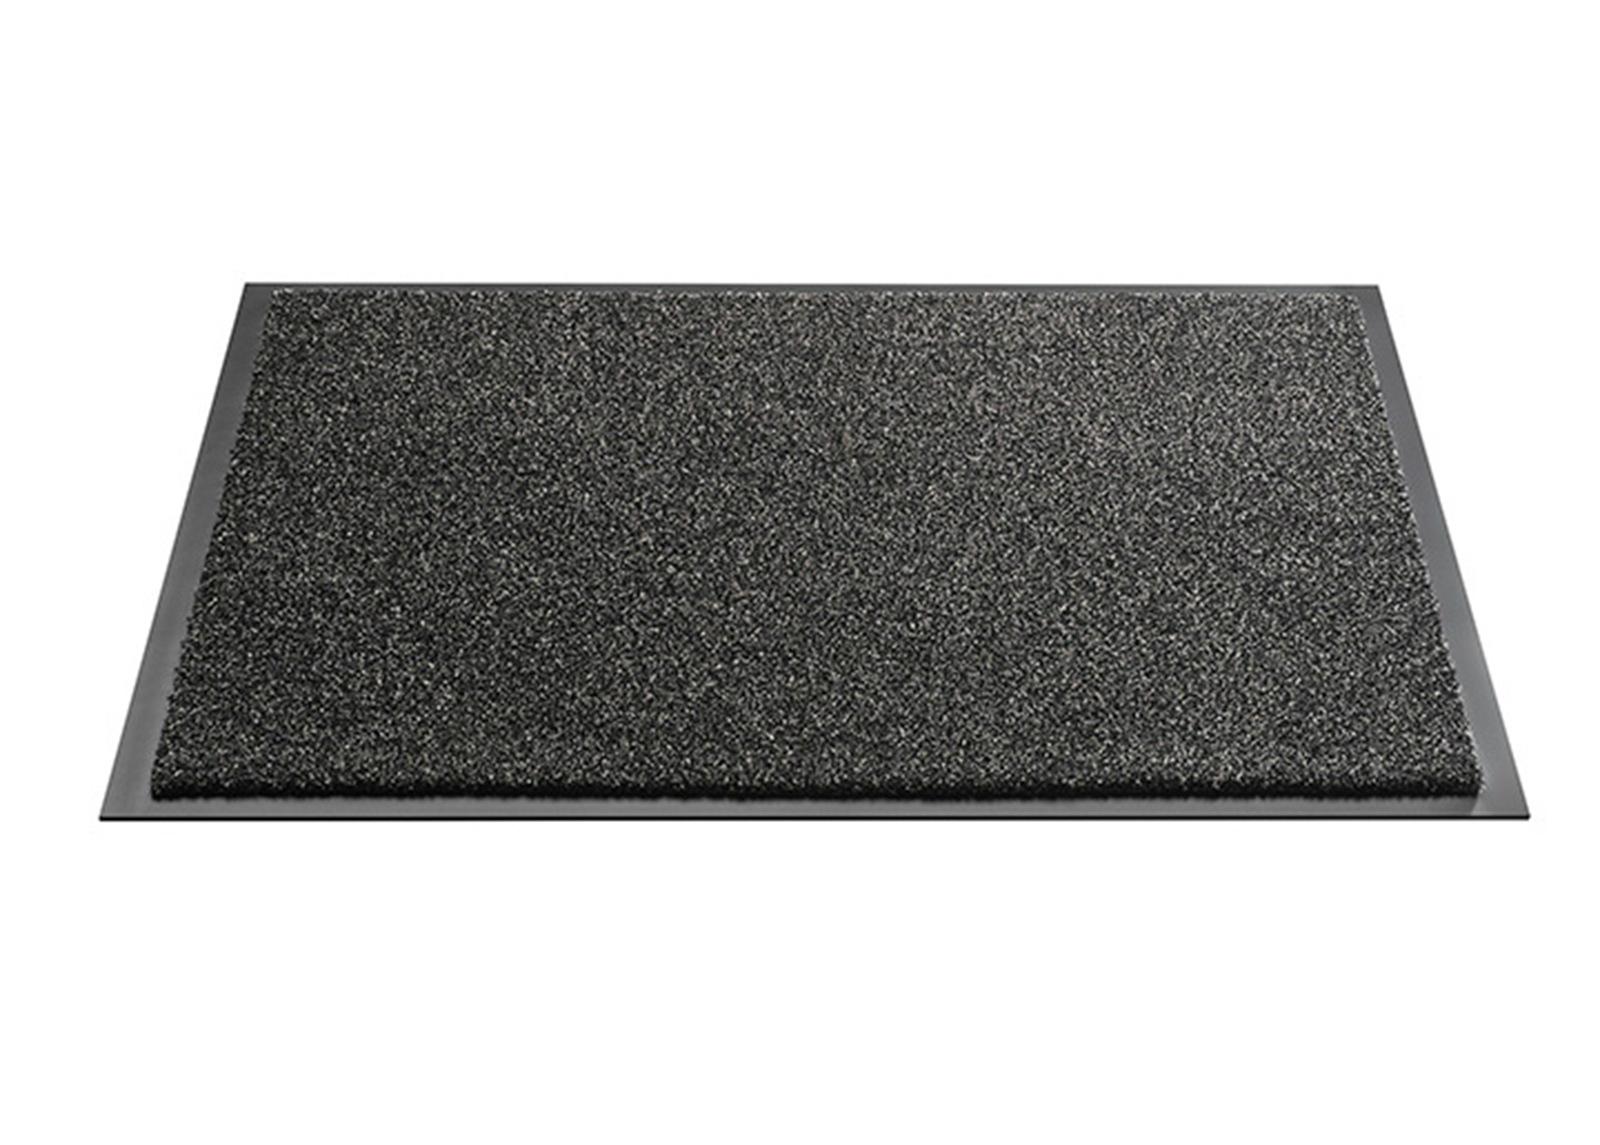 Ovimatto Briljant 80x120 cm